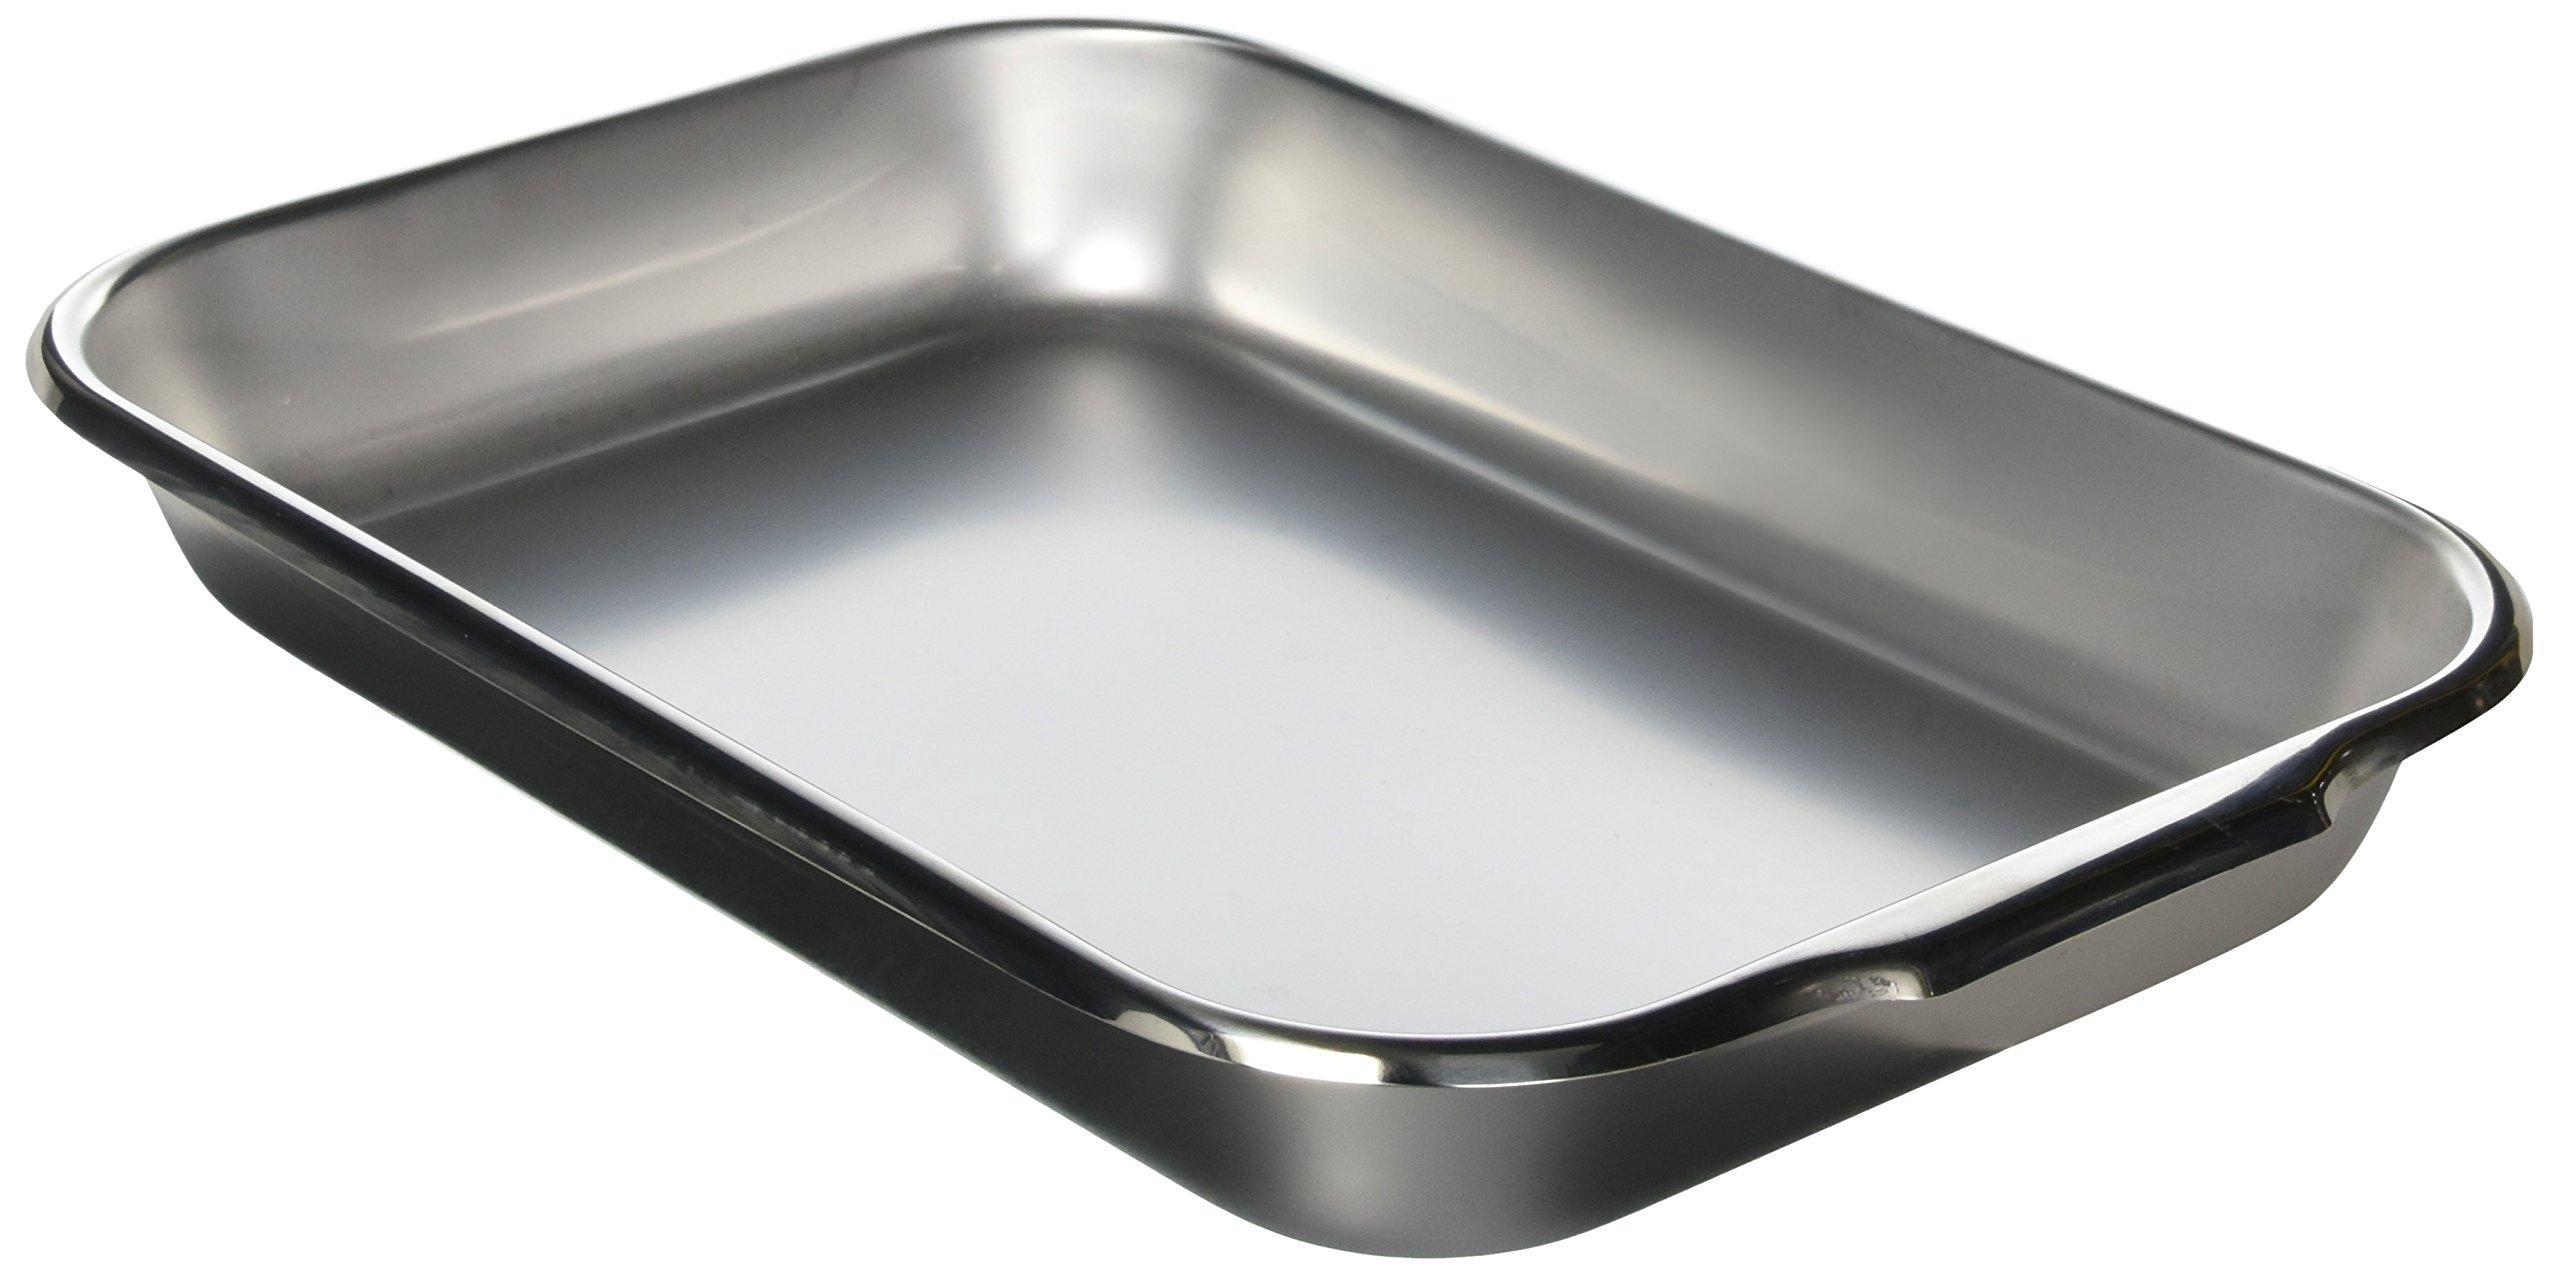 Vollrath 61230 3.5-Quart Bake Roast Pan, 14-7/8 x 10-1/4 x 2-inch, Stainless Steel, NSF